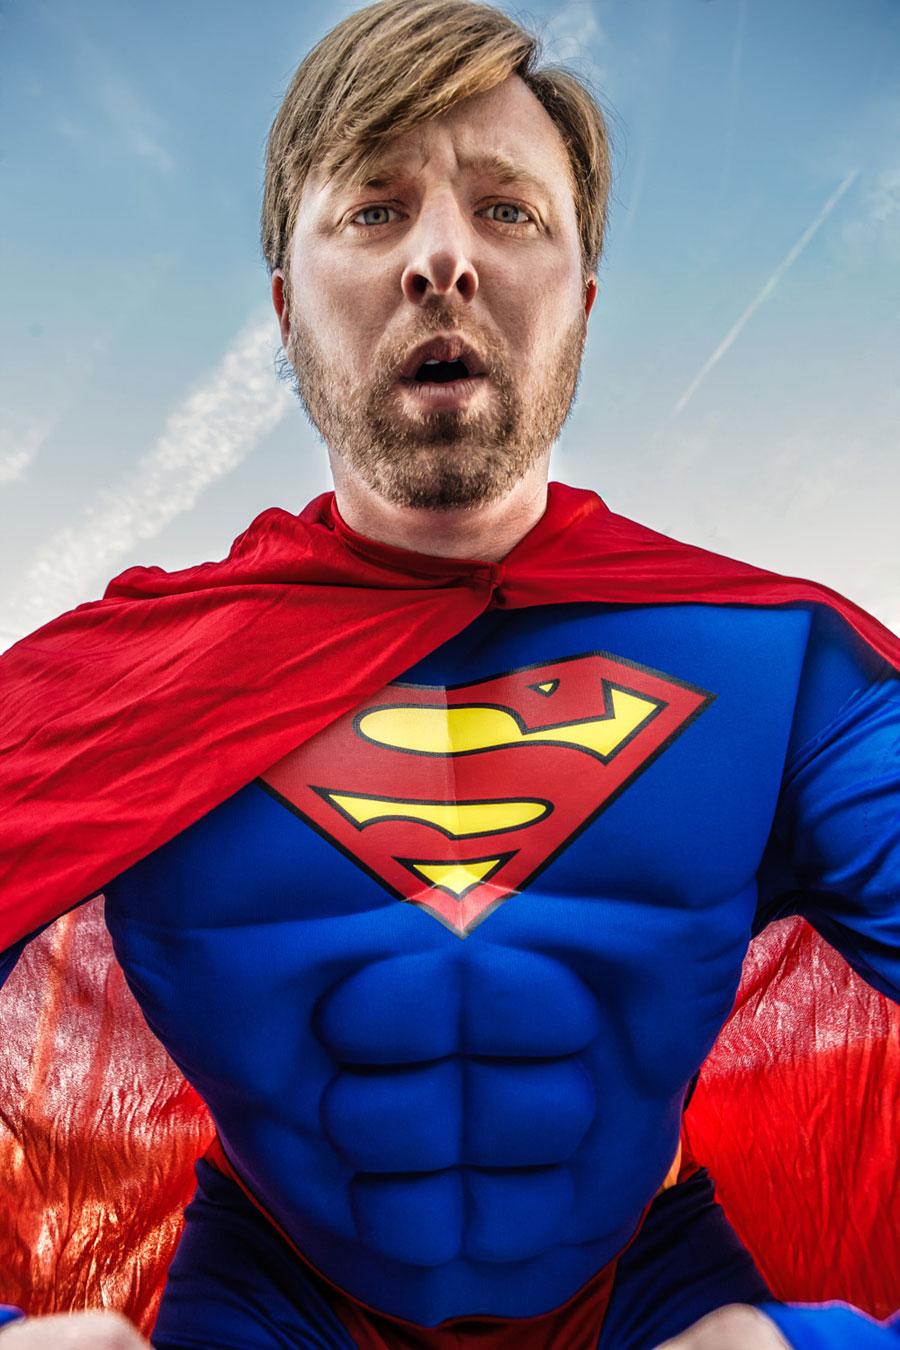 SupermanEngagementShoot-04